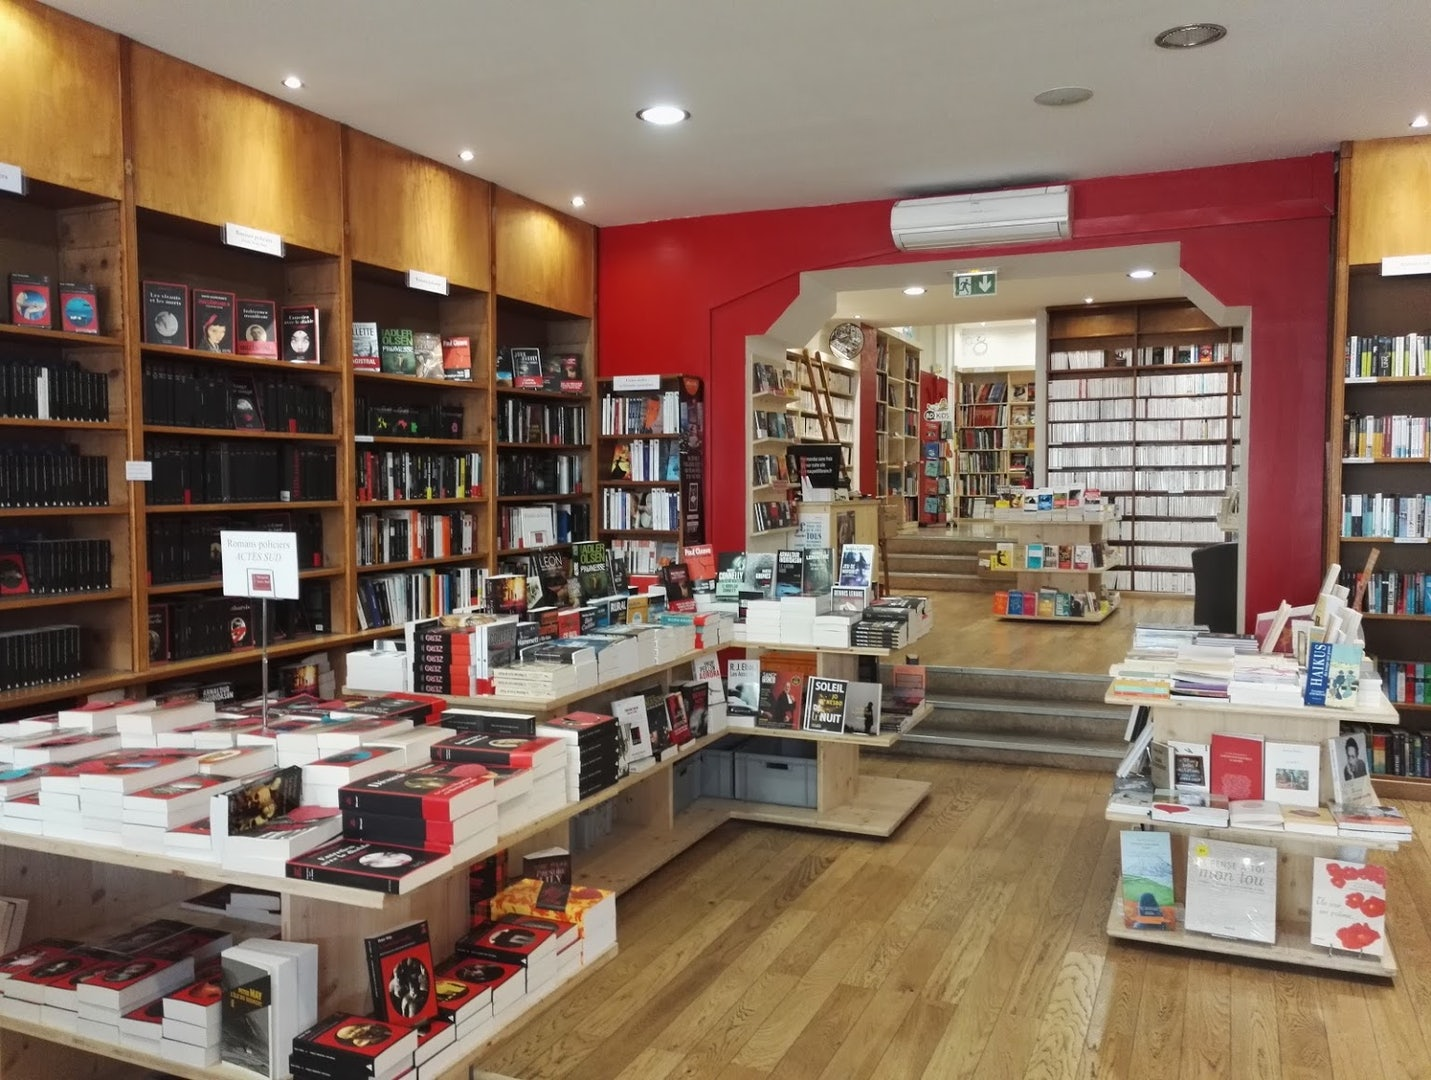 interior of the Librairie Maupetit